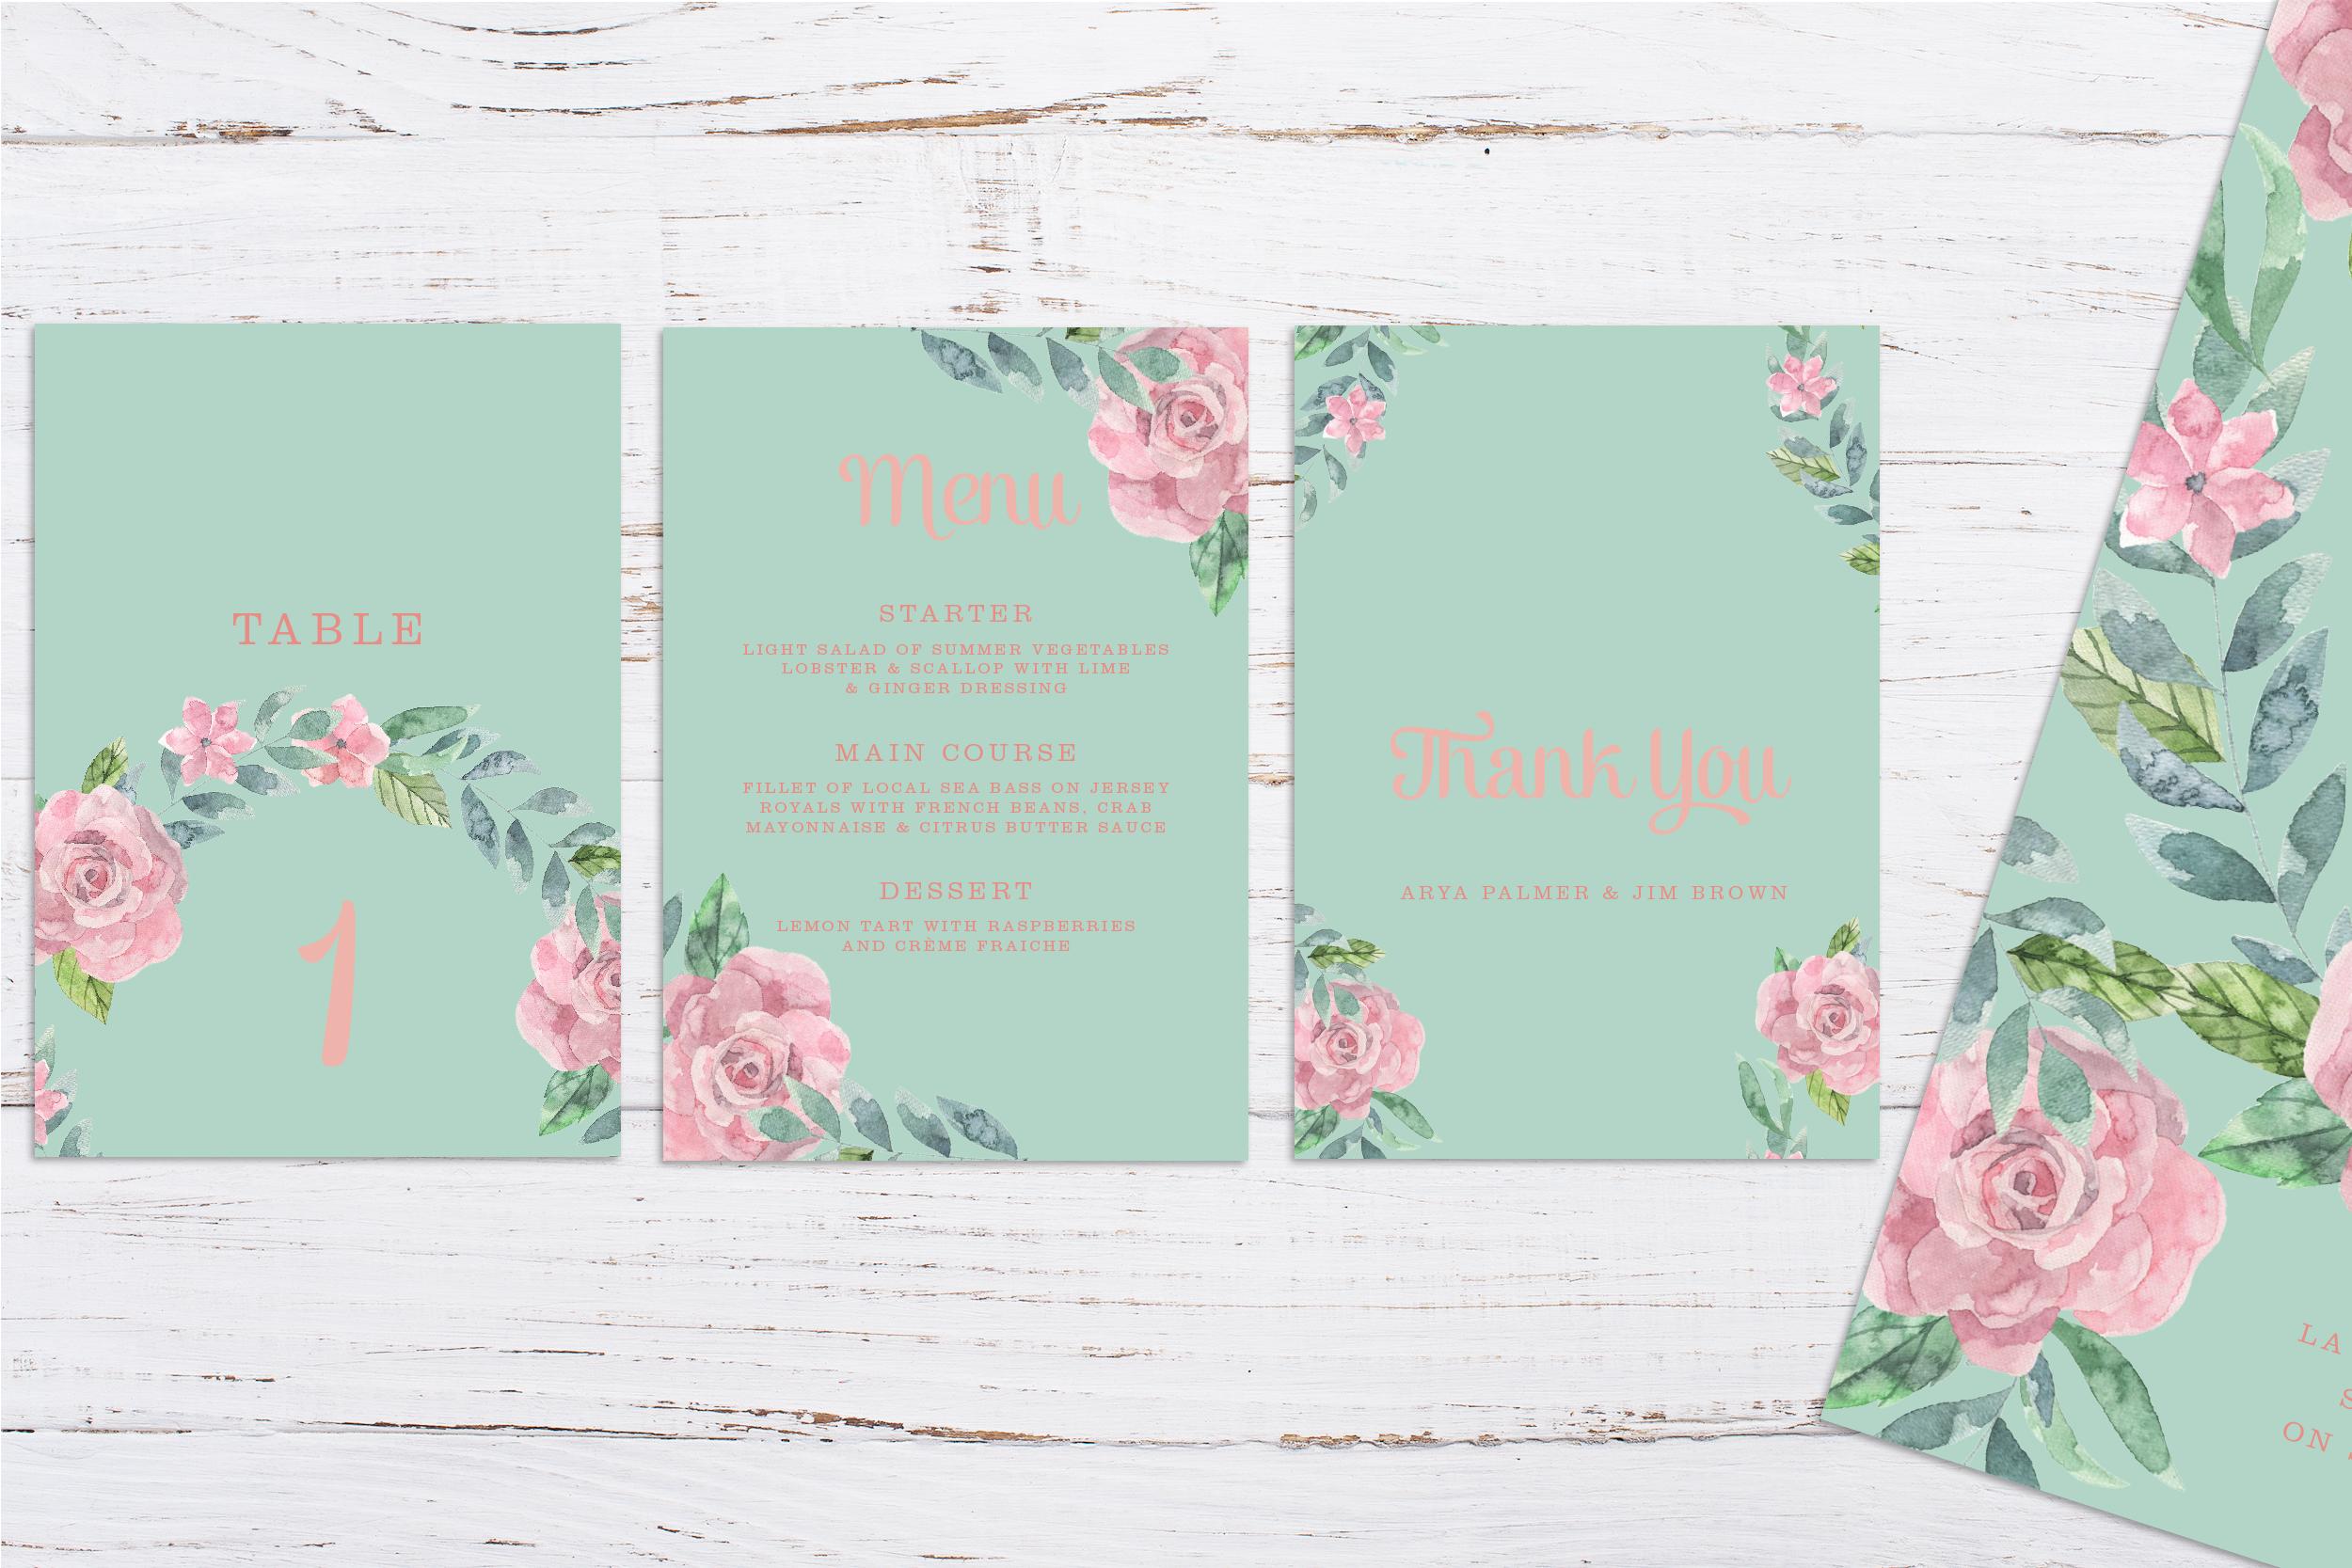 Digital printed floral wedding stationery